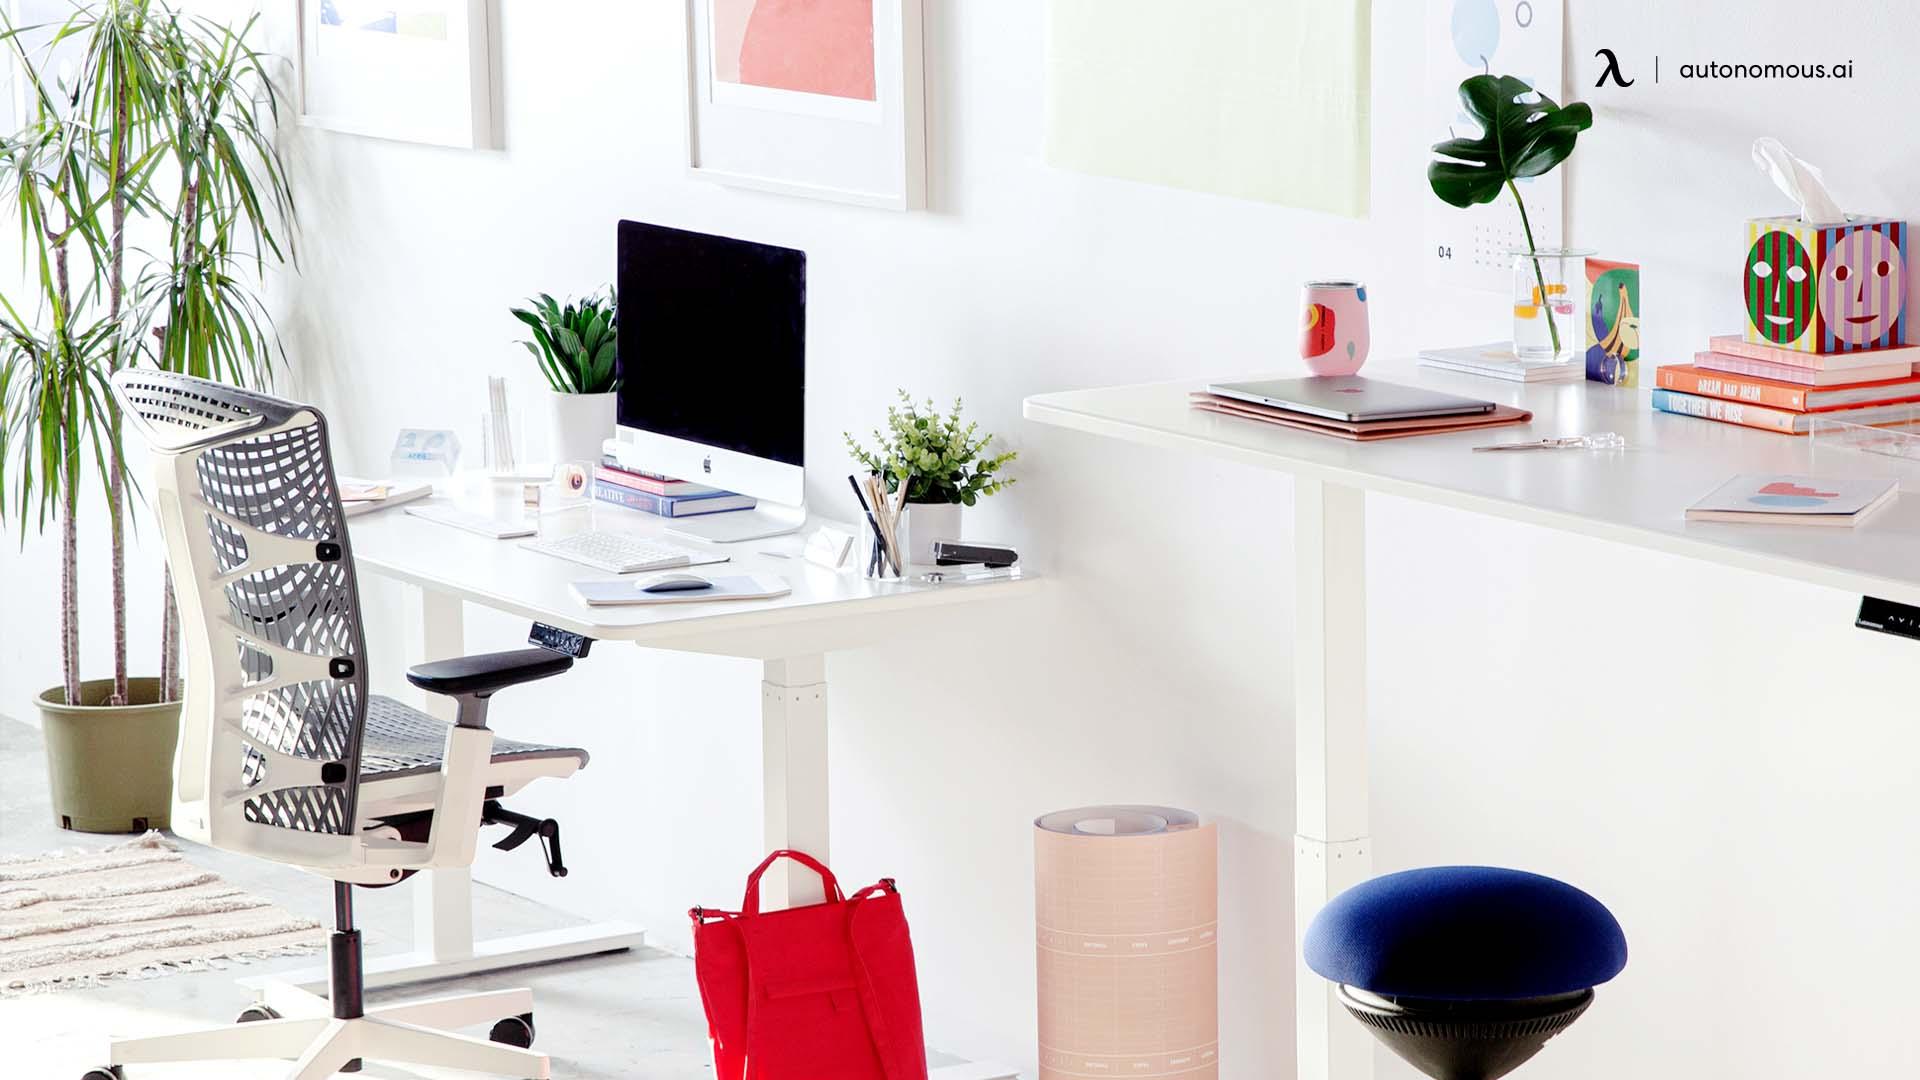 Ergonomic workspace for homeschooling